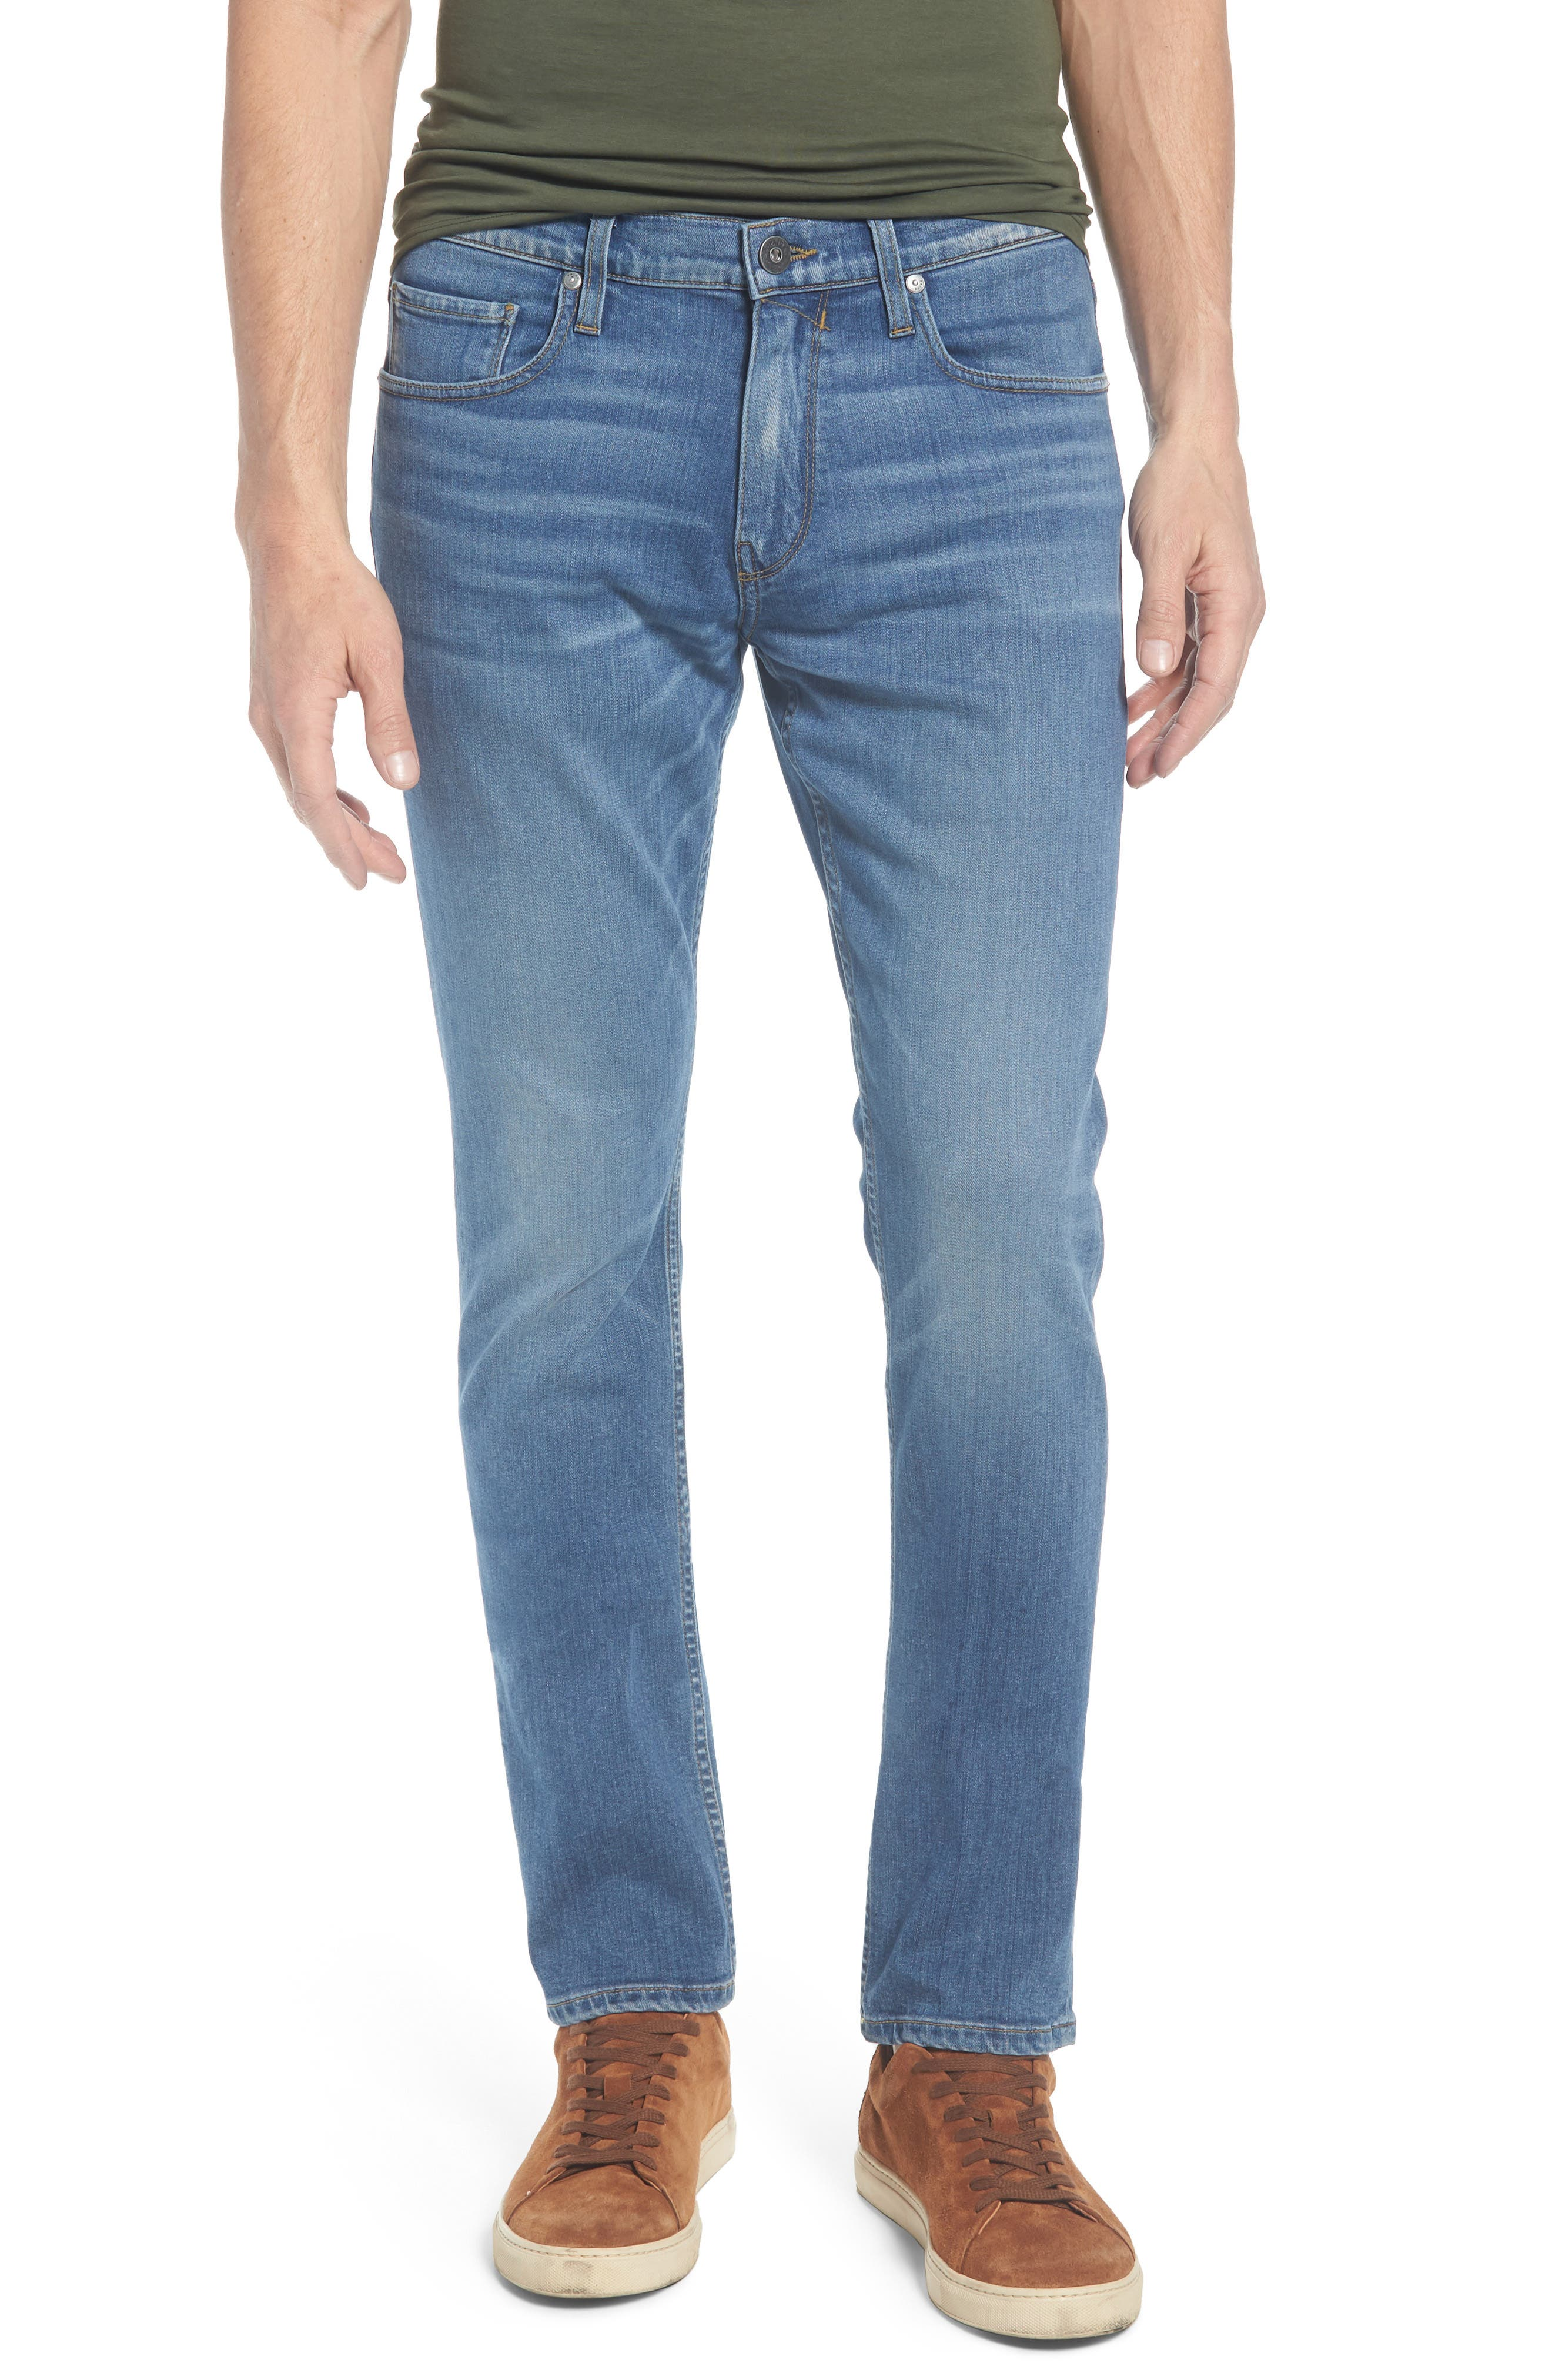 Transcend - Federal Slim Straight Leg Jeans,                         Main,                         color, Caine